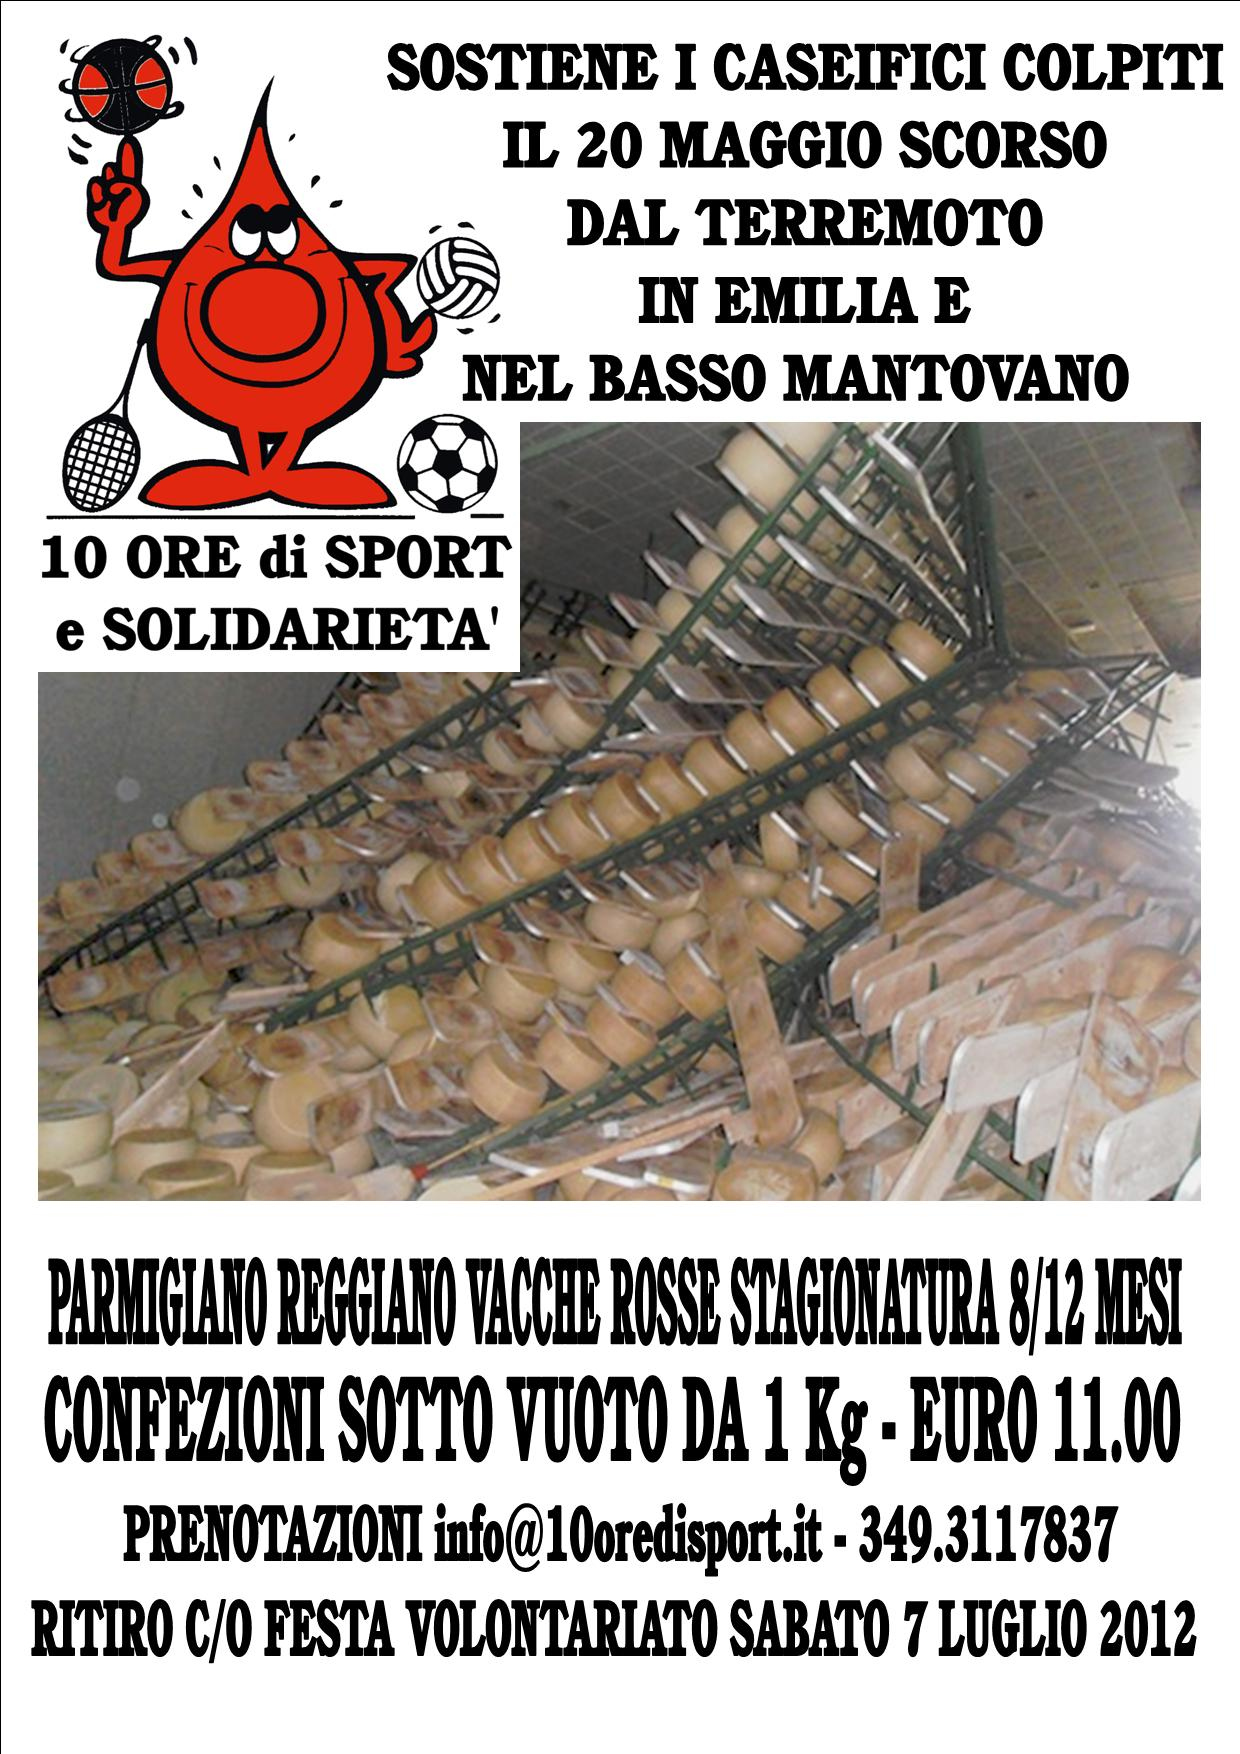 Aiutiamo i Caseifici del Parmigiano Reggiano